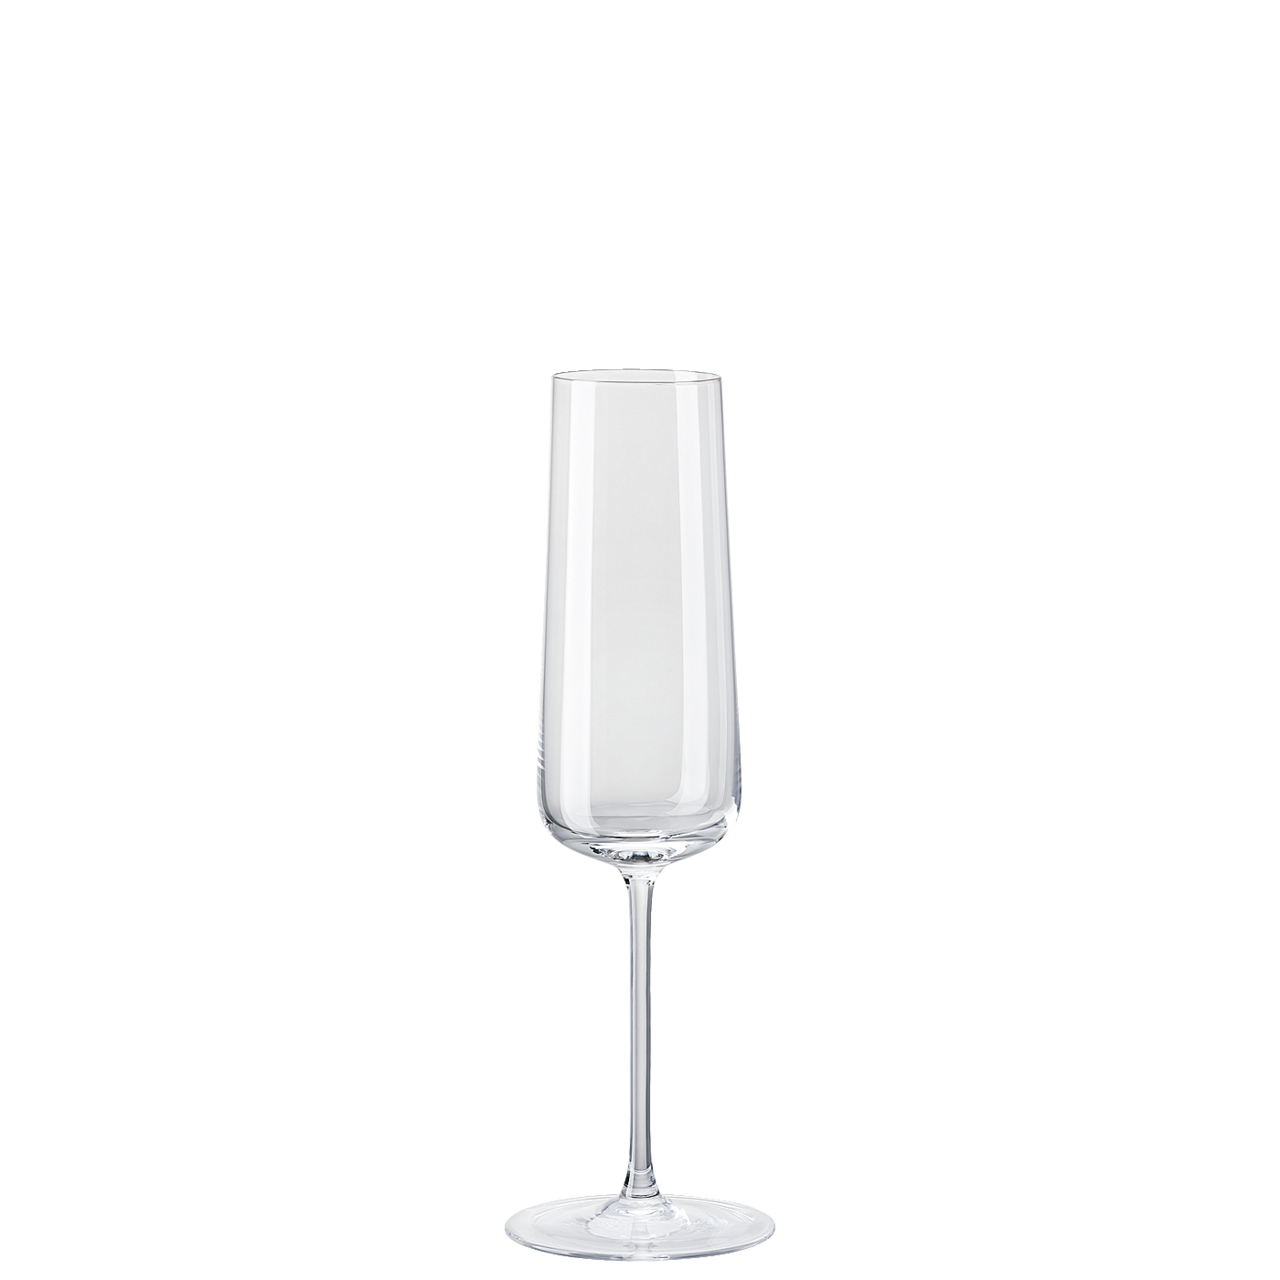 Champagnerflöte Turandot Klar Rosenthal